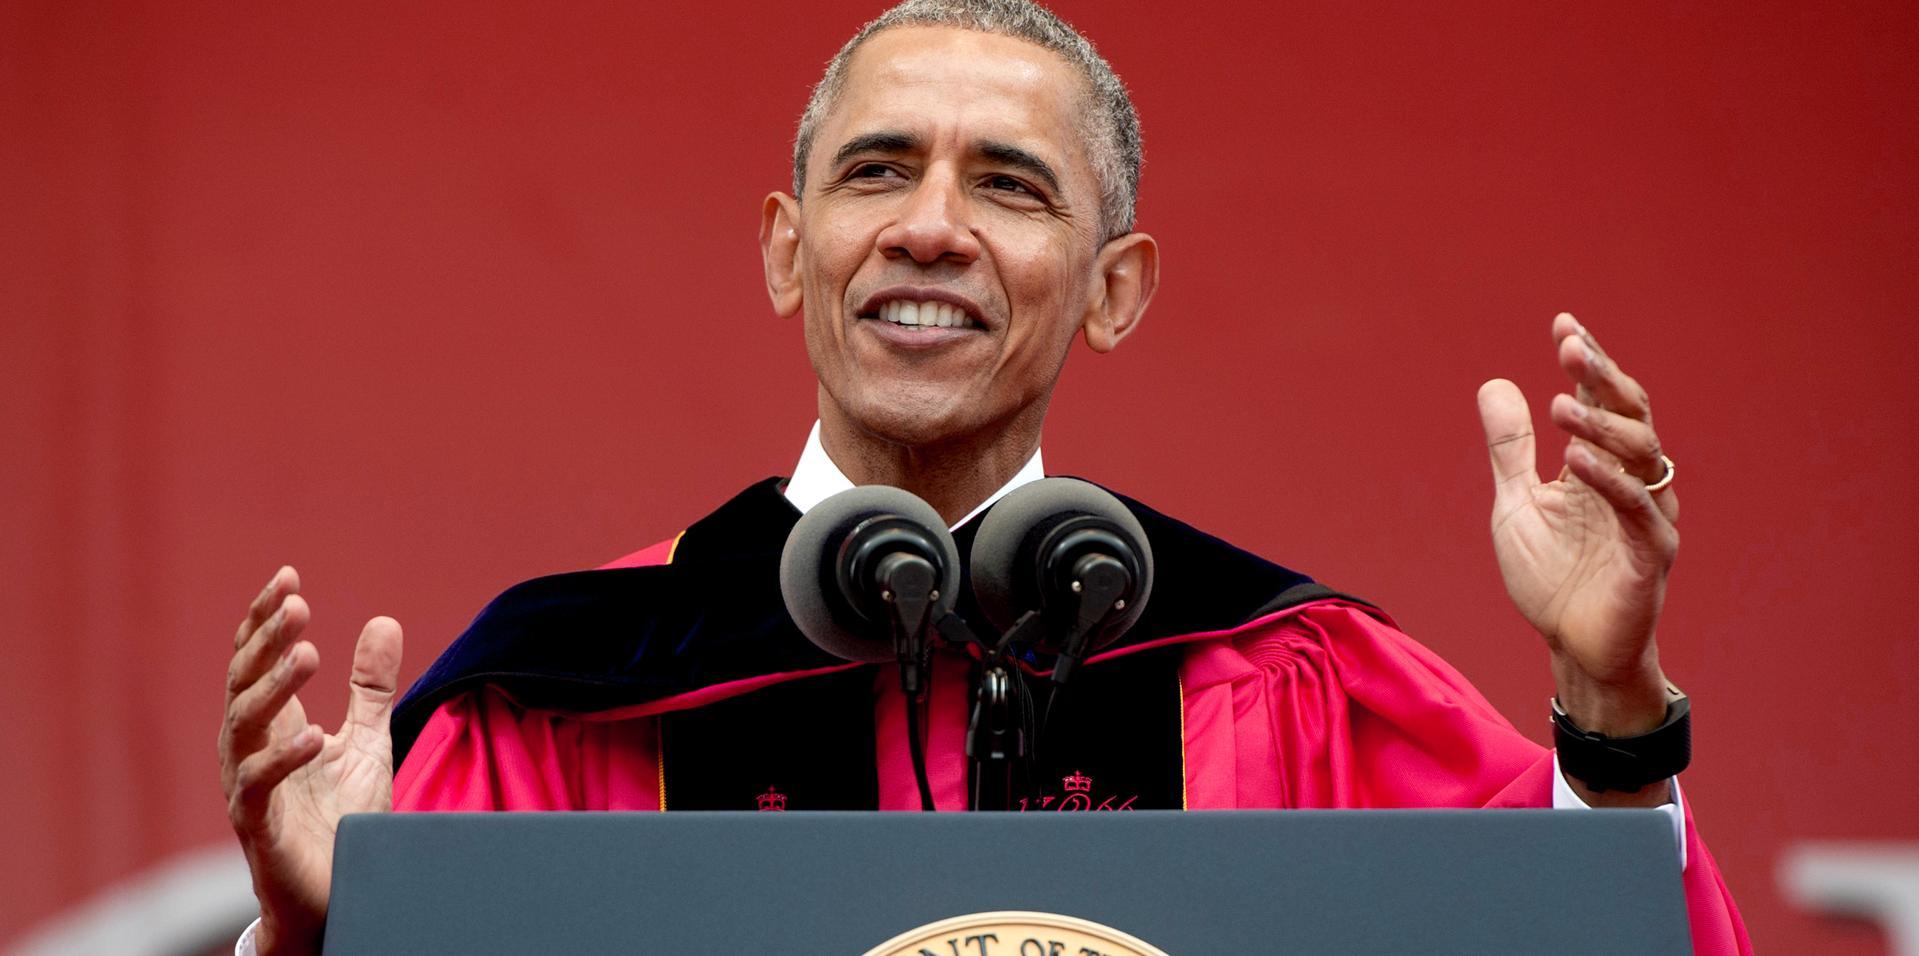 hero-Barack-Obama-by-Saul-Loeb-AFP-Getty-Images